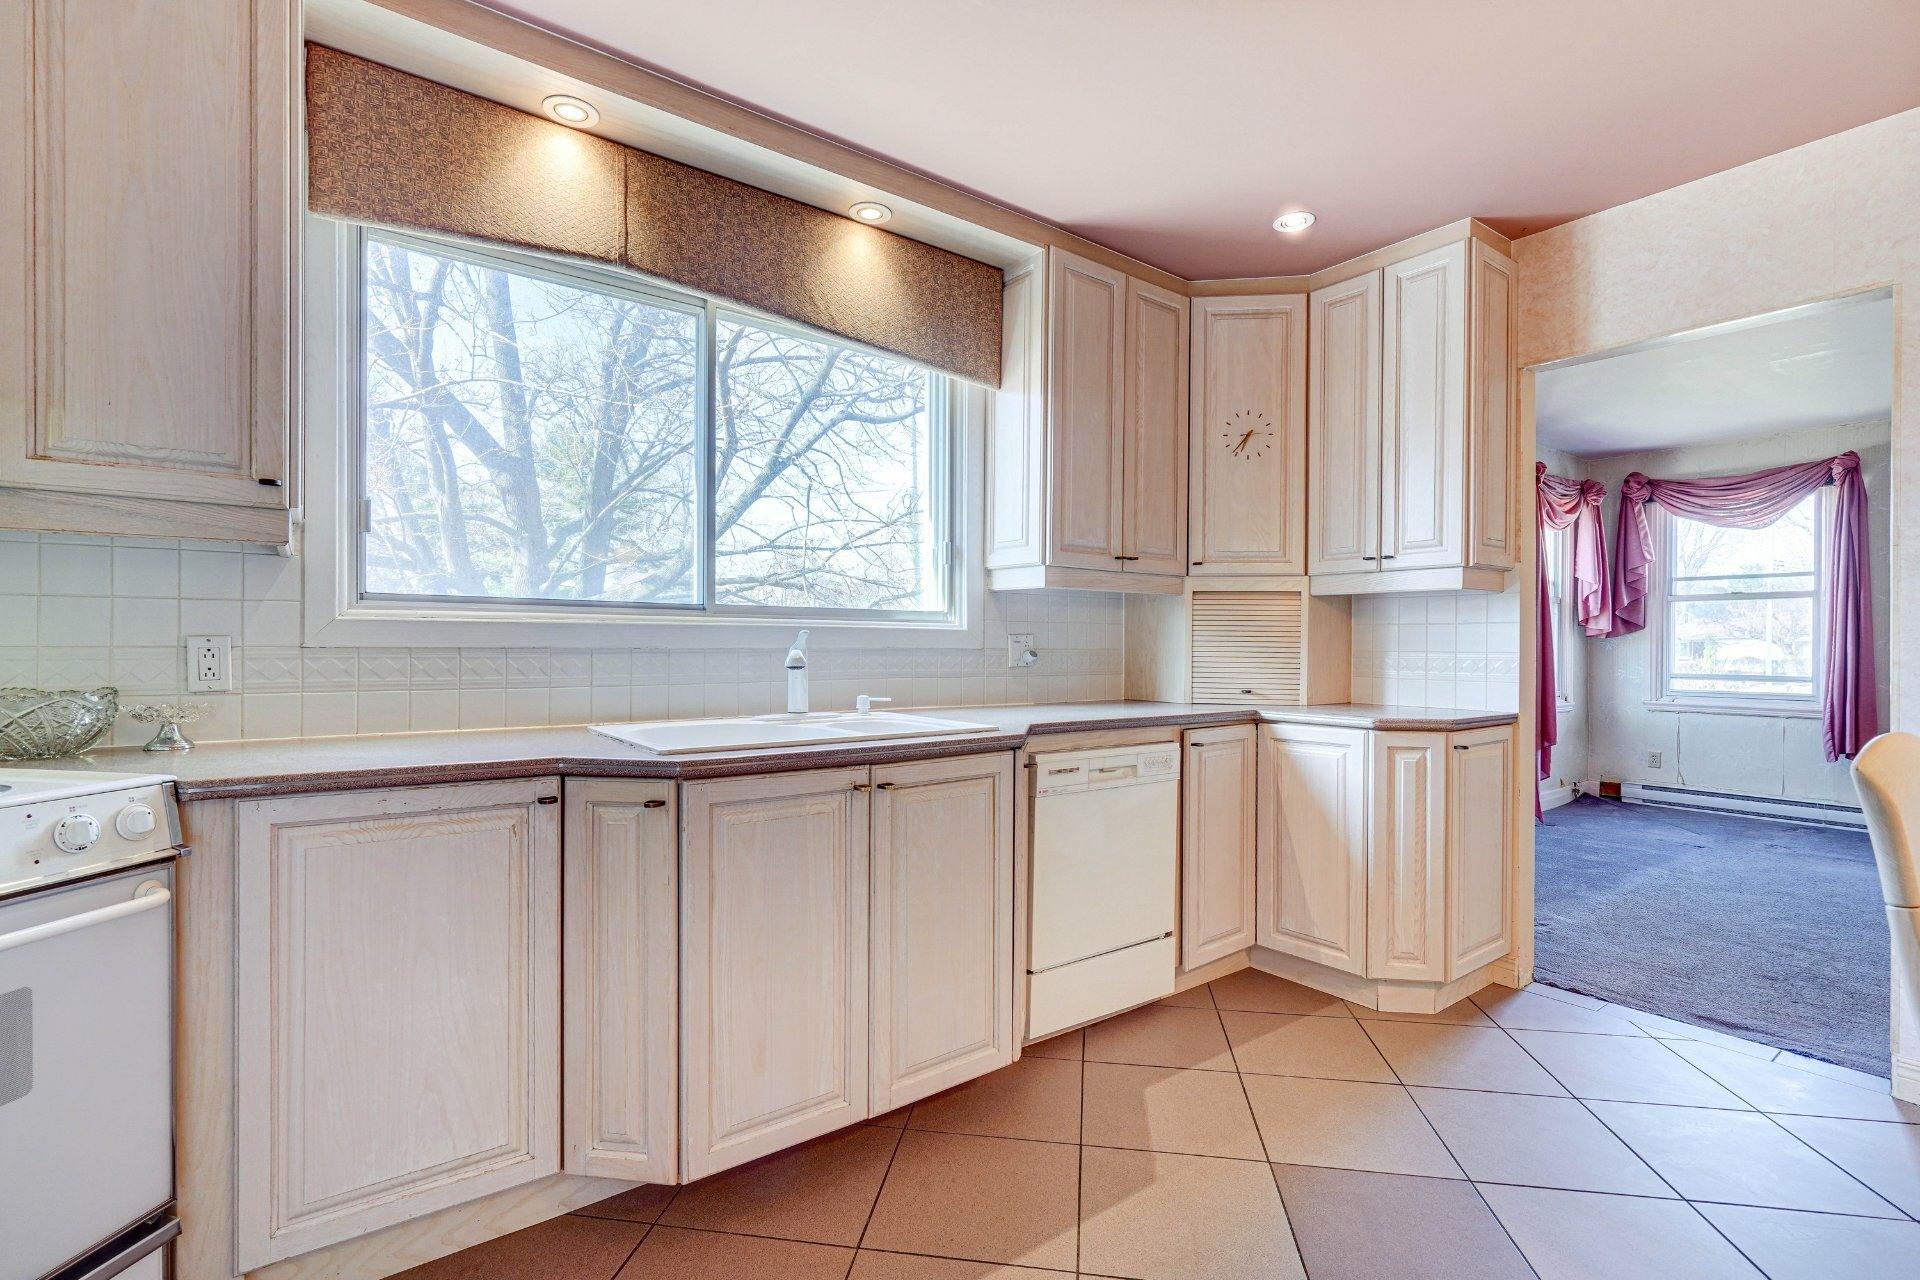 image 6 - Triplex For sale Dorval - 4 rooms